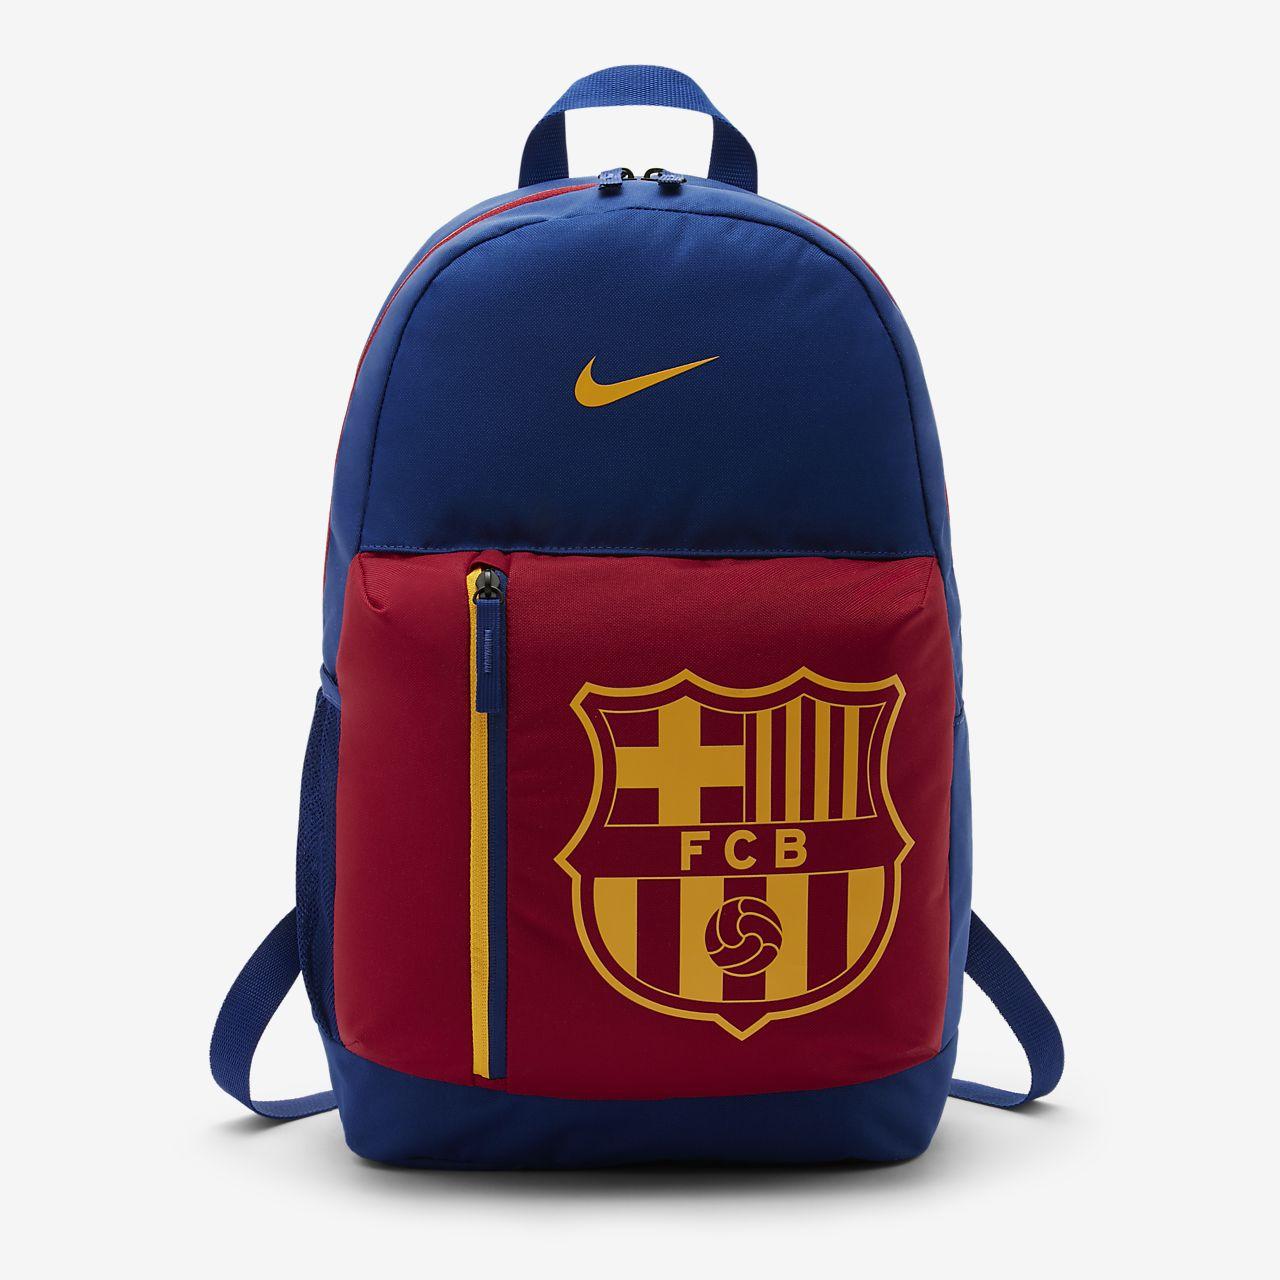 reputable site 4acba 4bb76 Fotbollsryggsäck FC Barcelona Stadium för barn